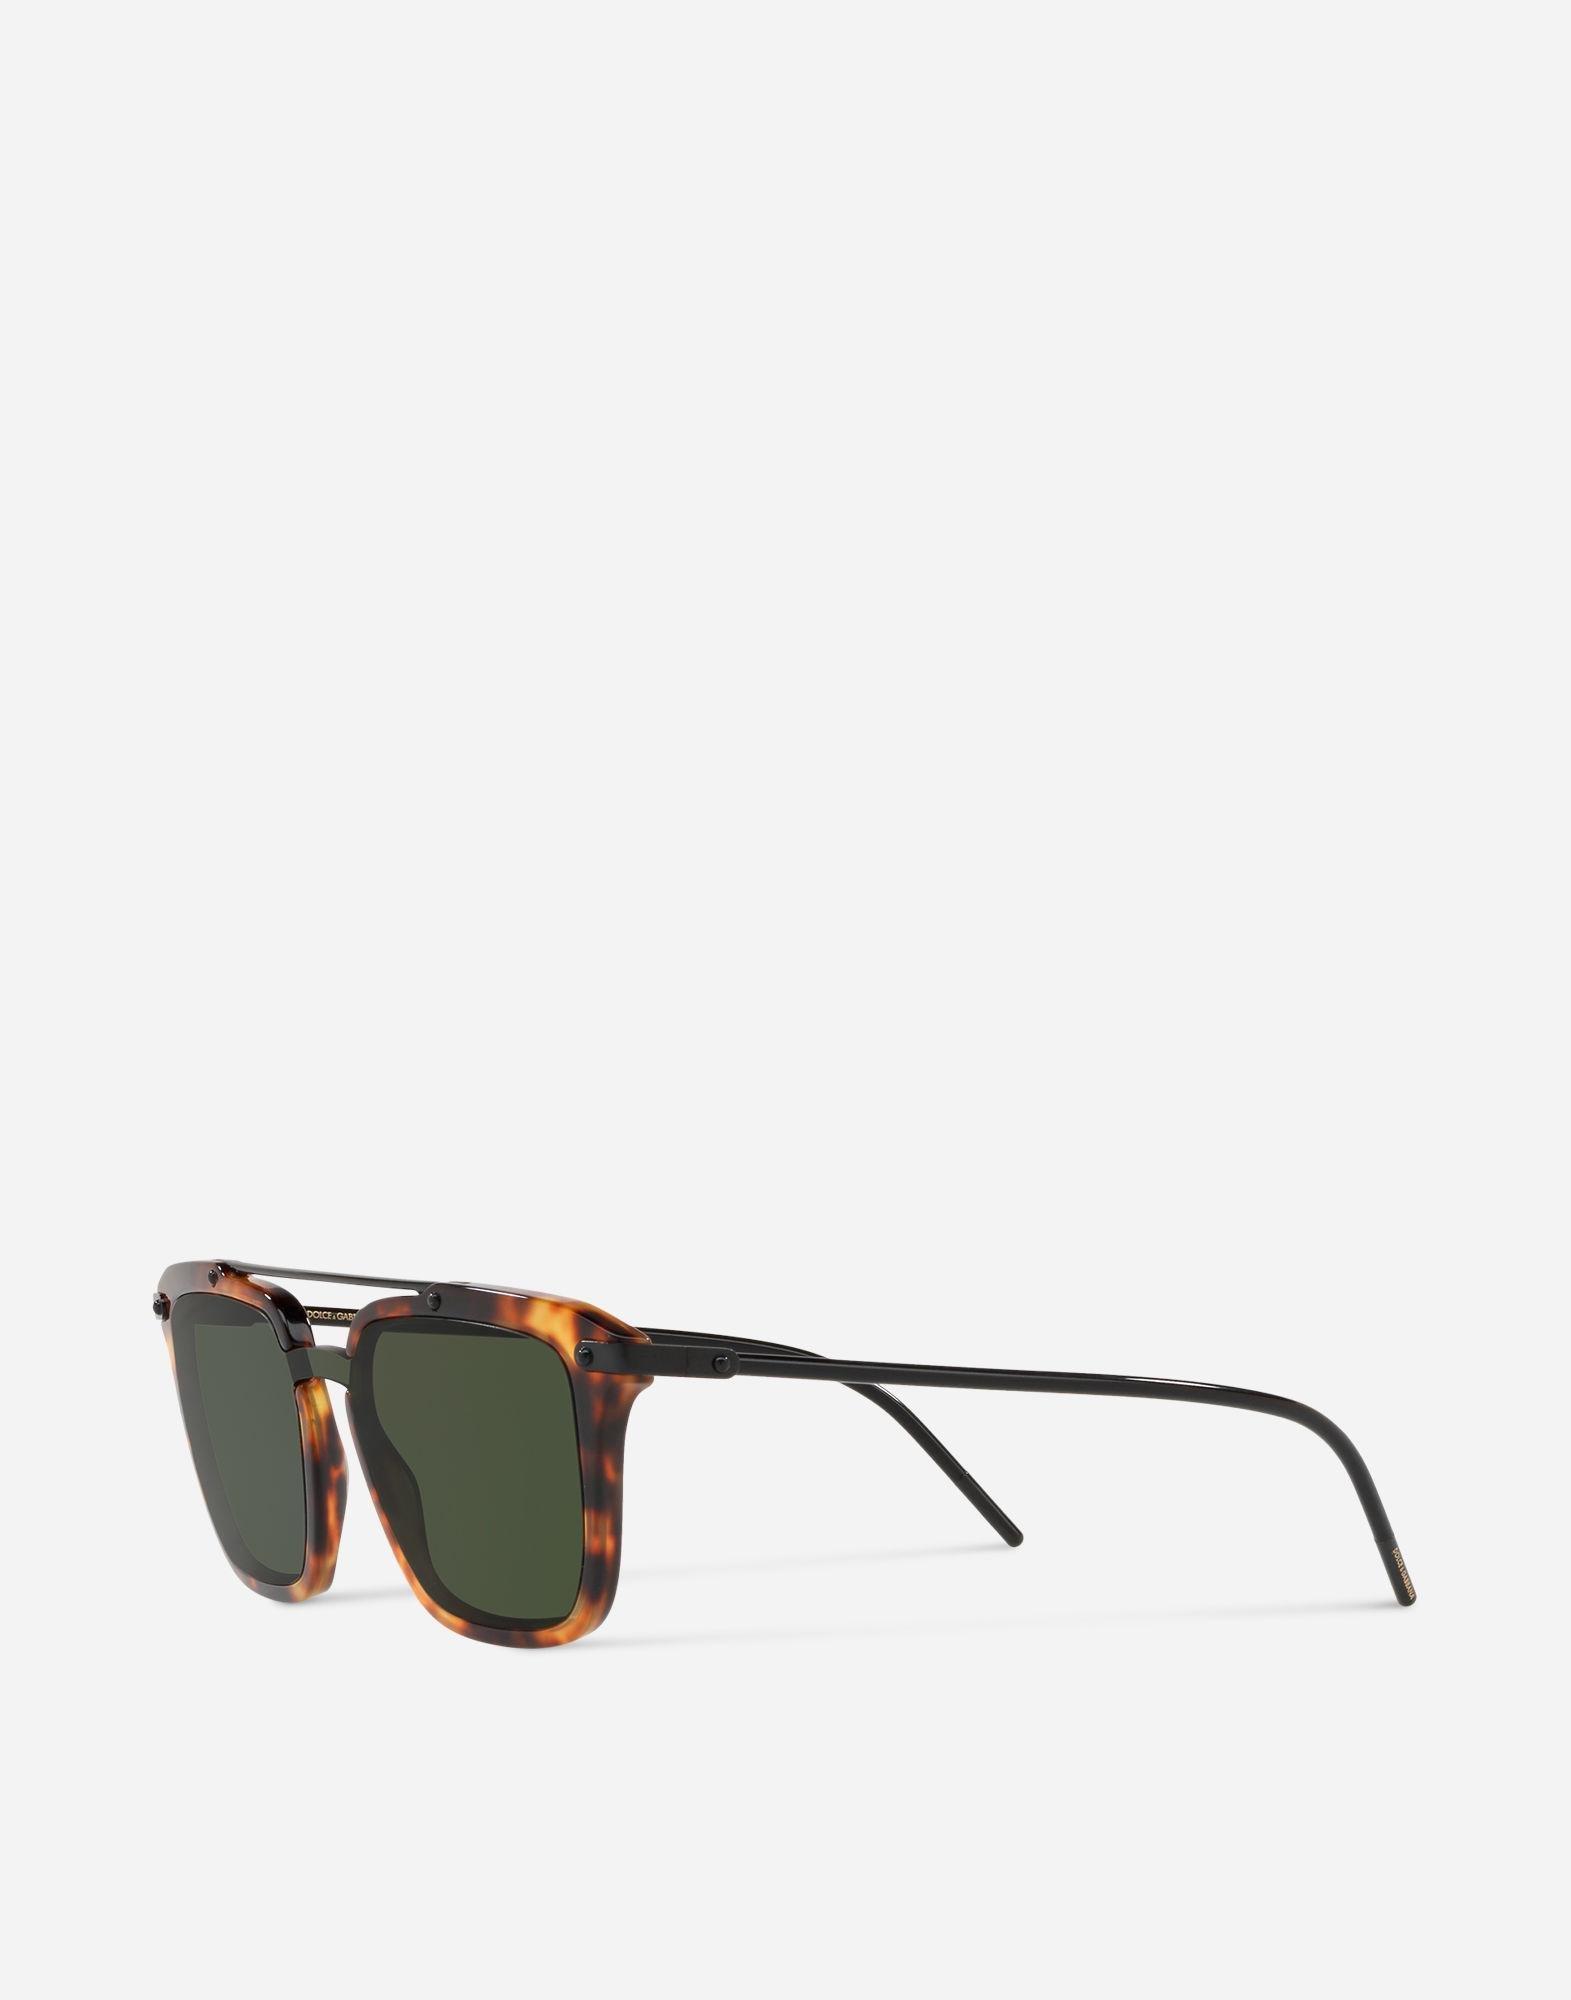 0b4634436ca Lyst - Dolce   Gabbana Square Sunglasses With Double Bridge for Men